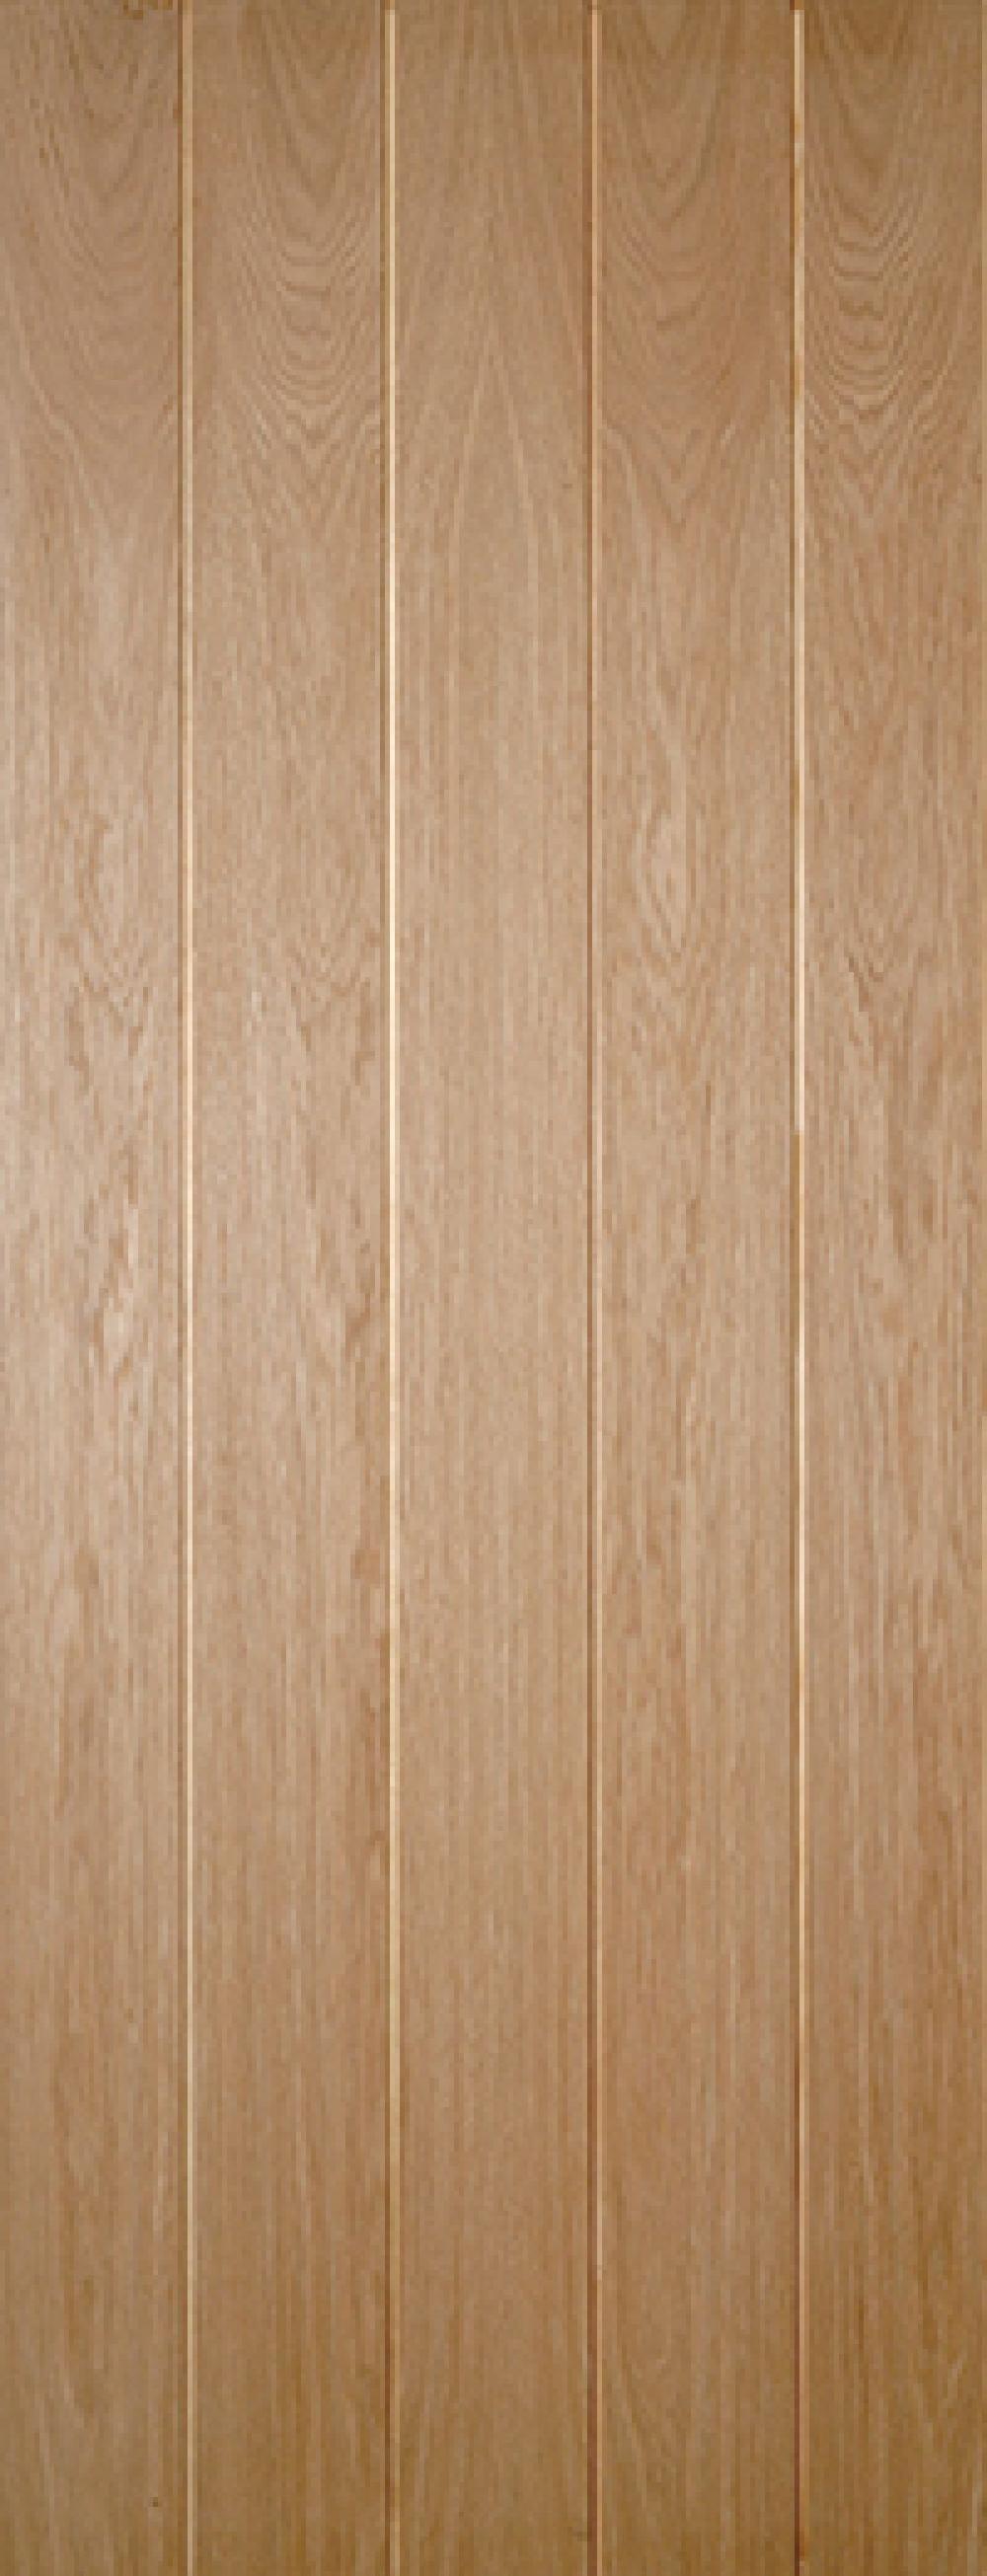 Galway Oak Image